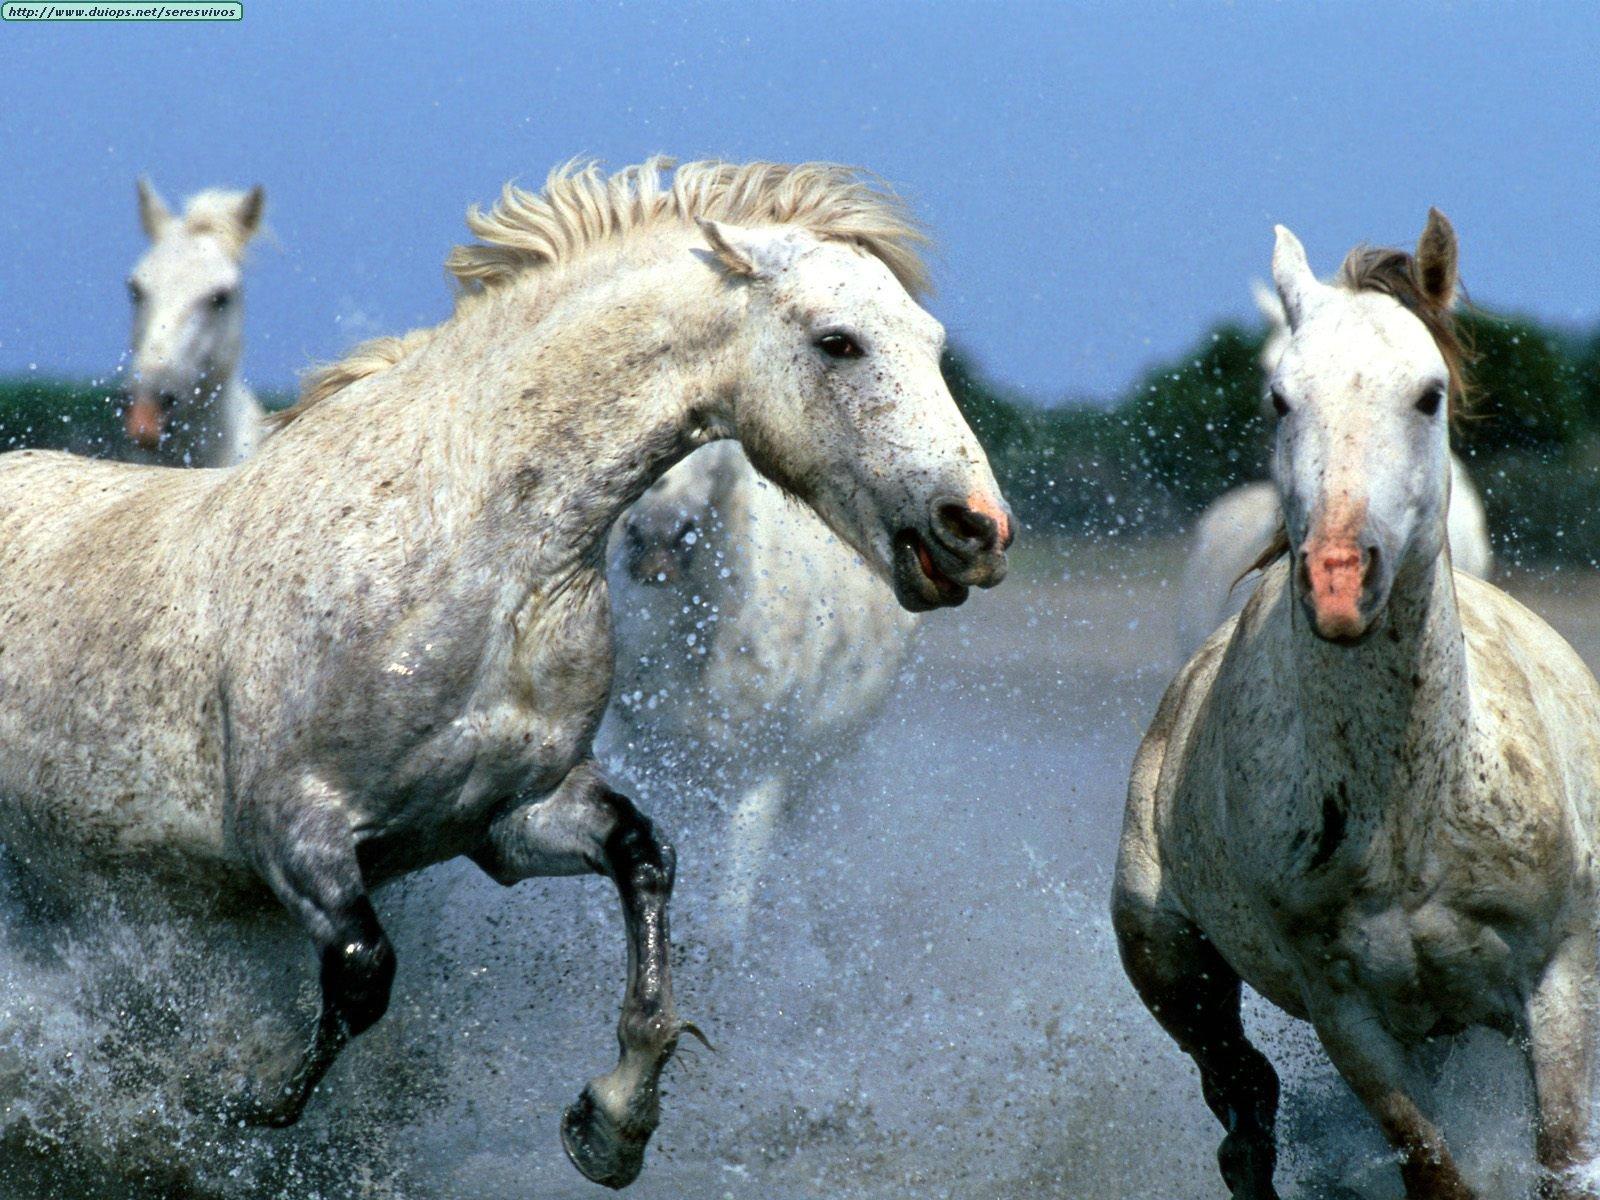 http://www.duiops.net/seresvivos/galeria/caballos/Animals%20Horses_Afternoon%20Race.jpg